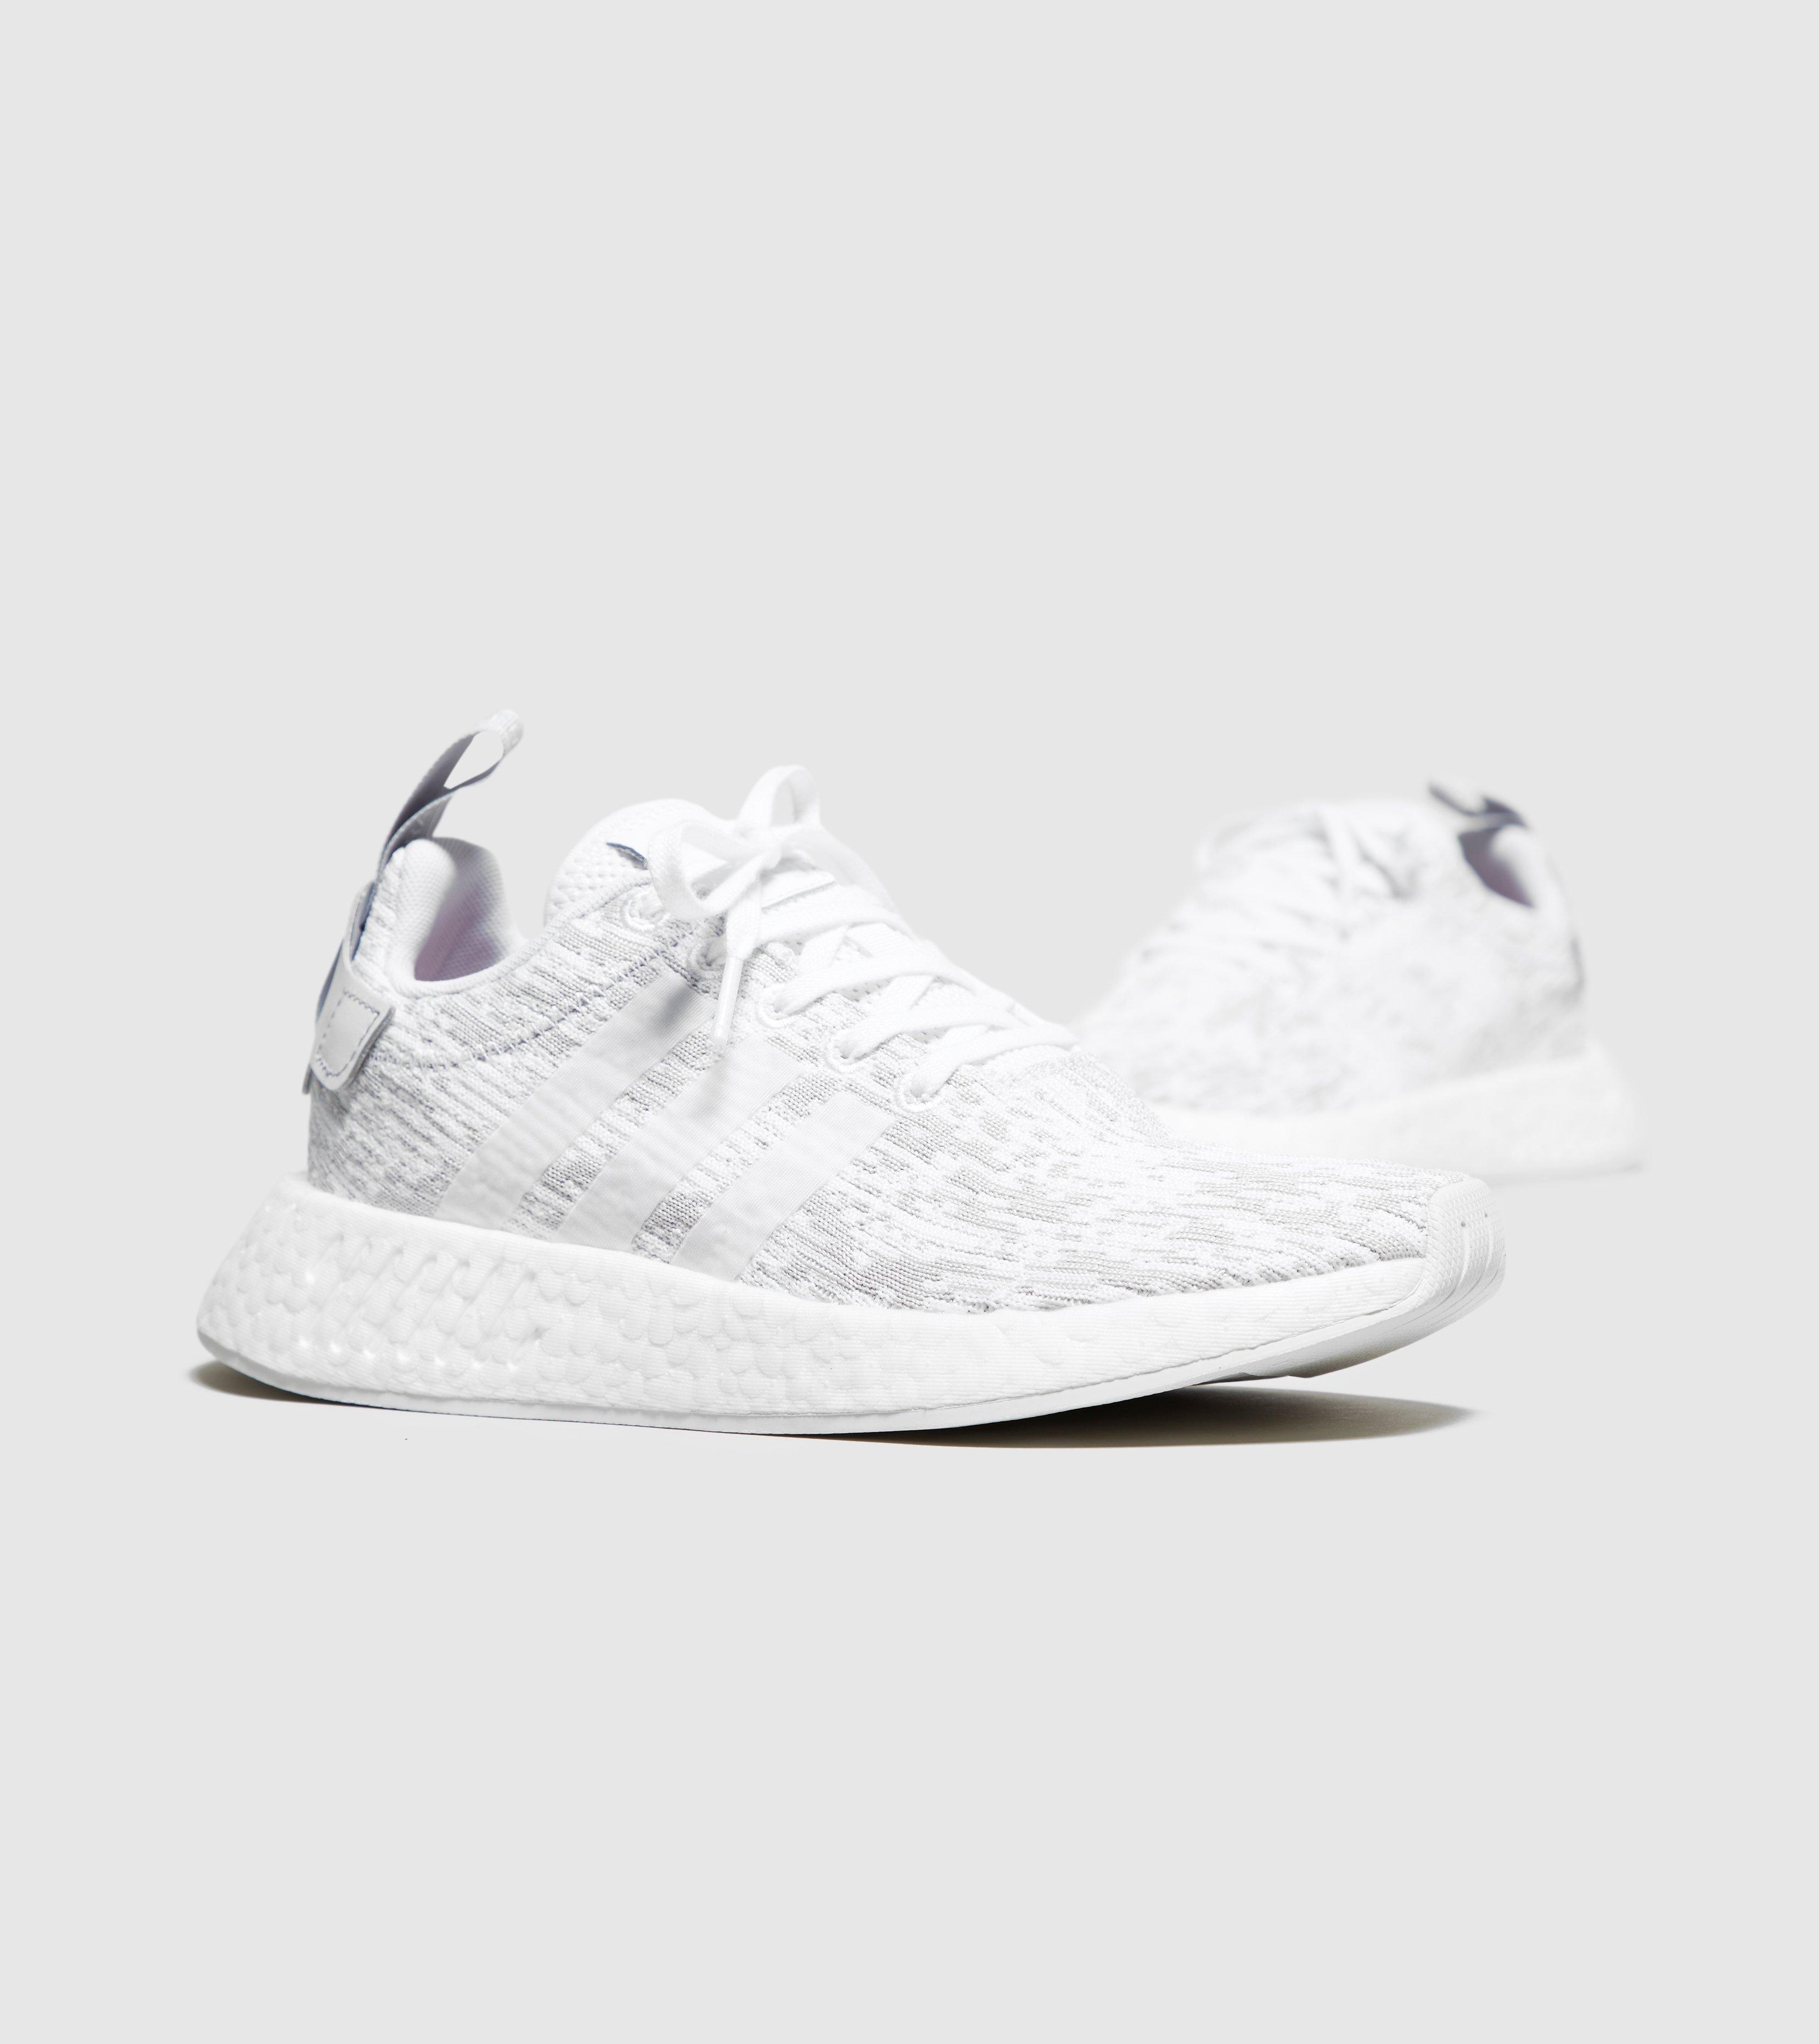 3b3efbb46924e adidas Originals Nmd R2 Women s in White - Lyst